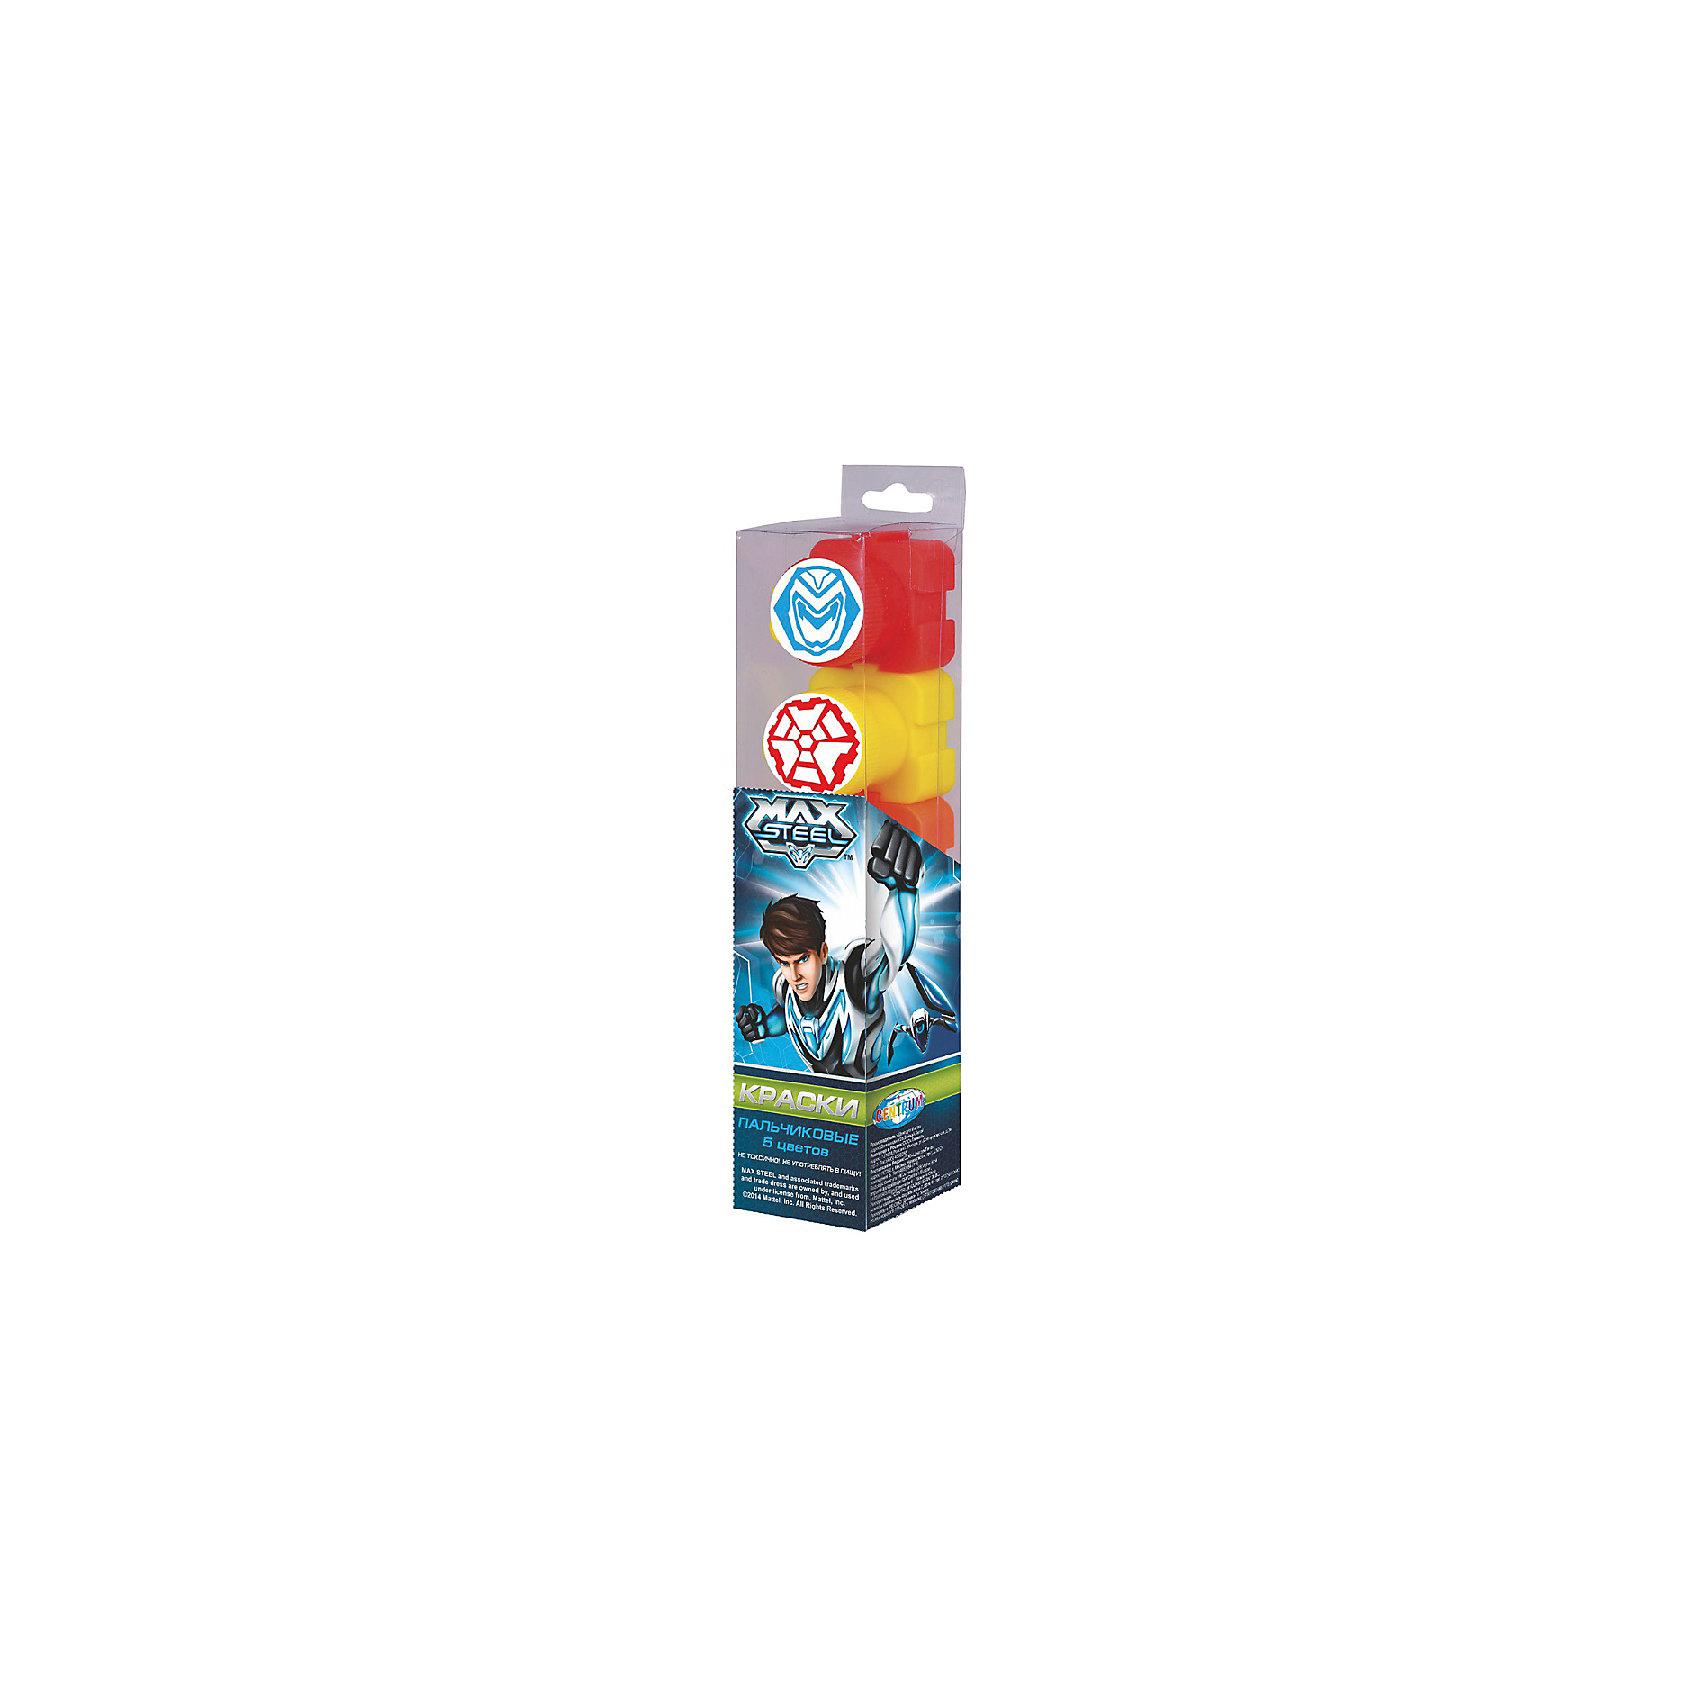 CENTRUM Пальчиковые краски со штампами (5 цветов х 20мл), Max Steel